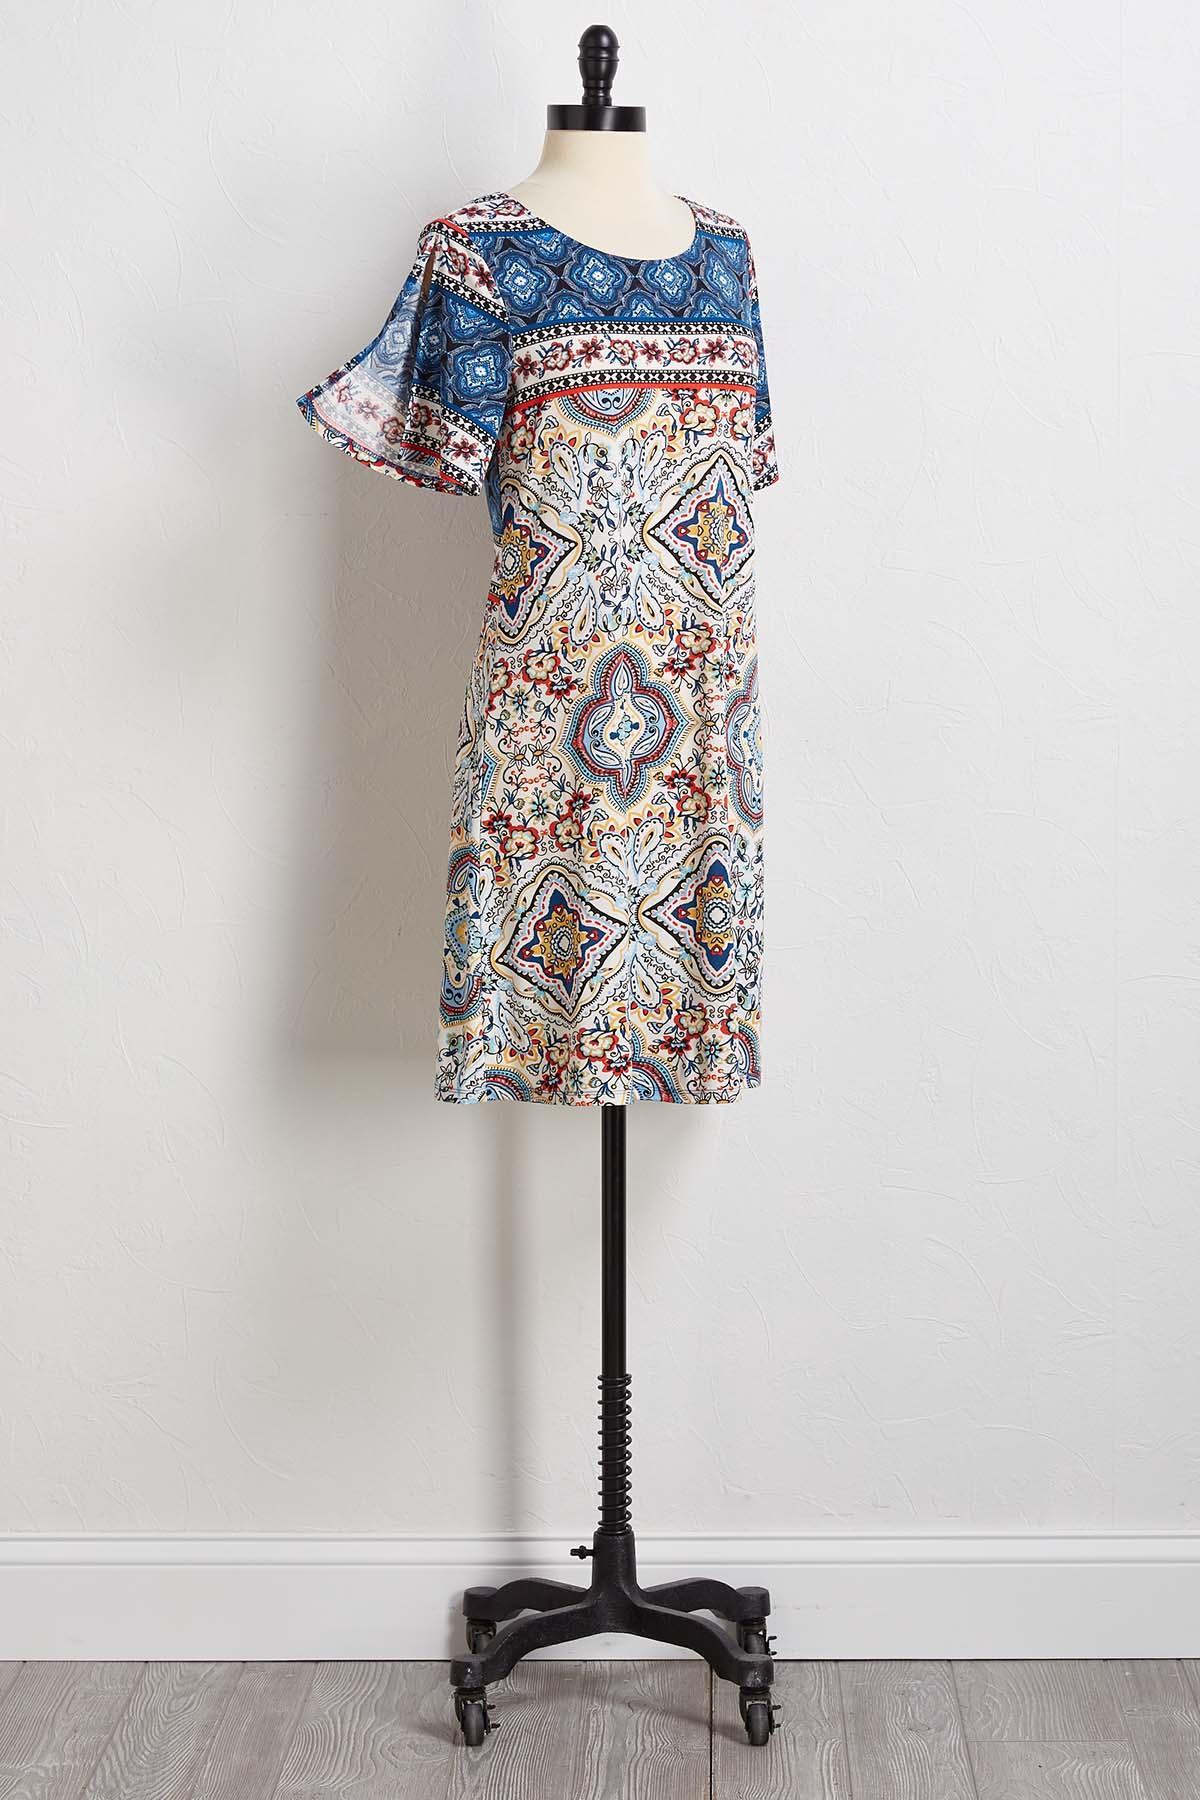 Moroccan Swing Dress